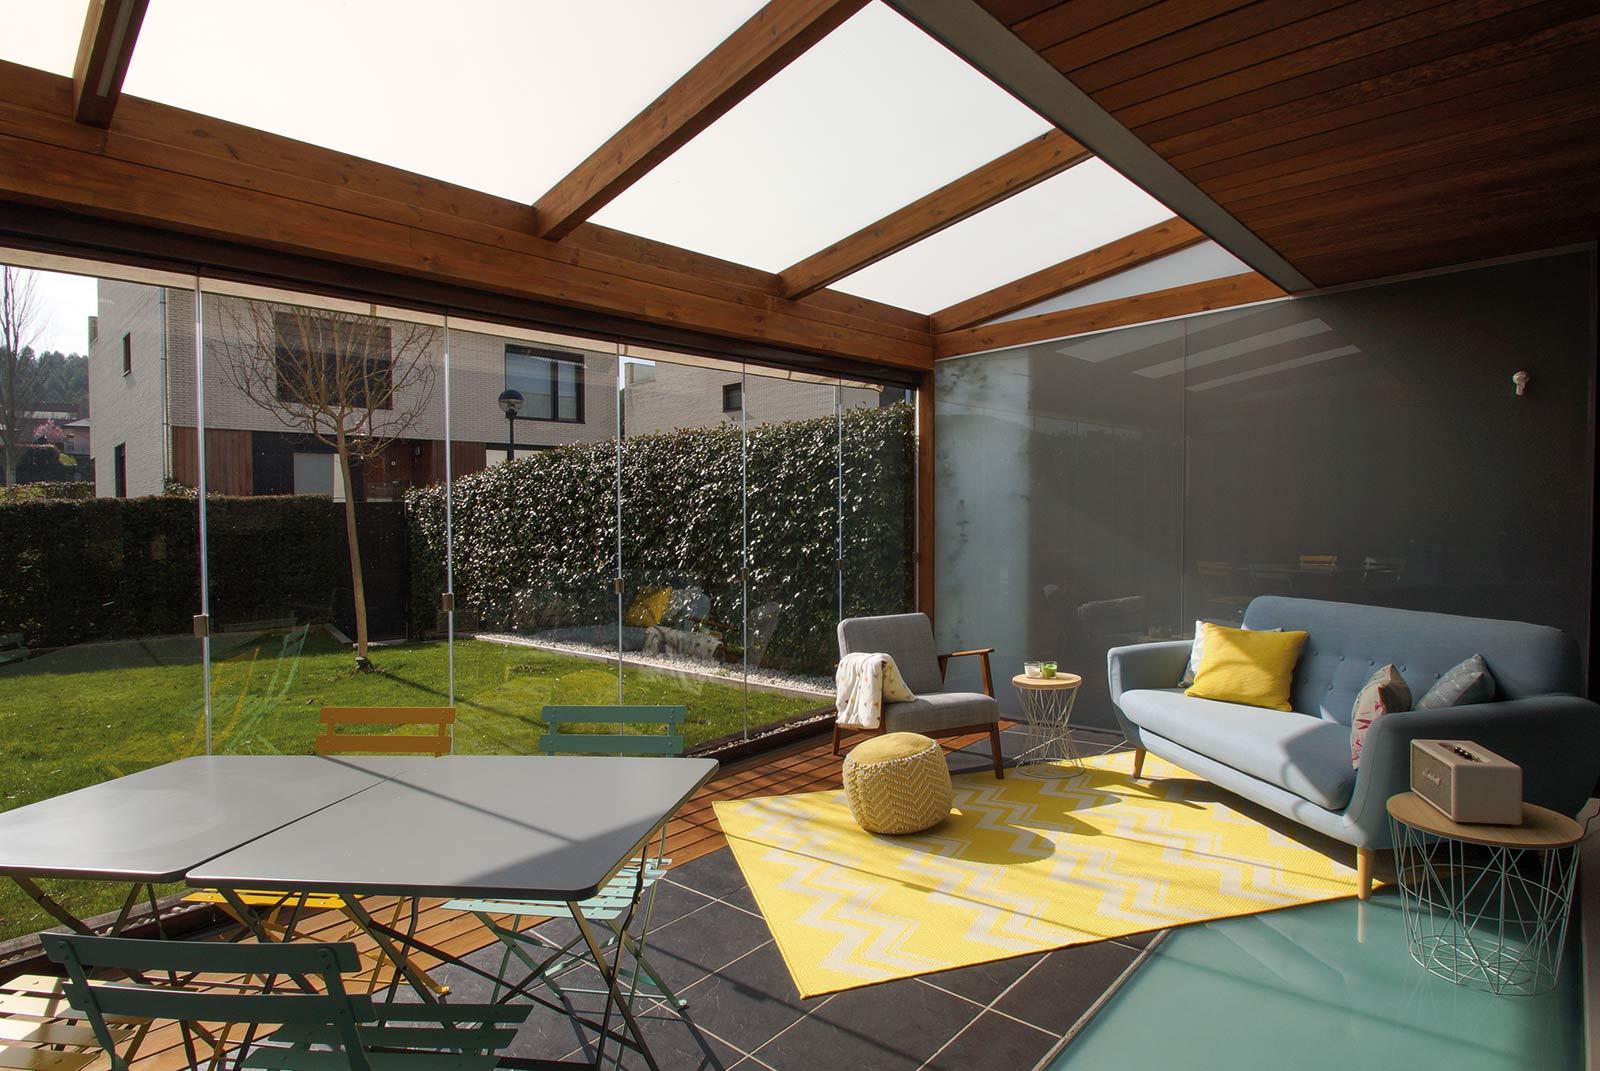 Porche de madera de estilo moderno con cortinas de cristal